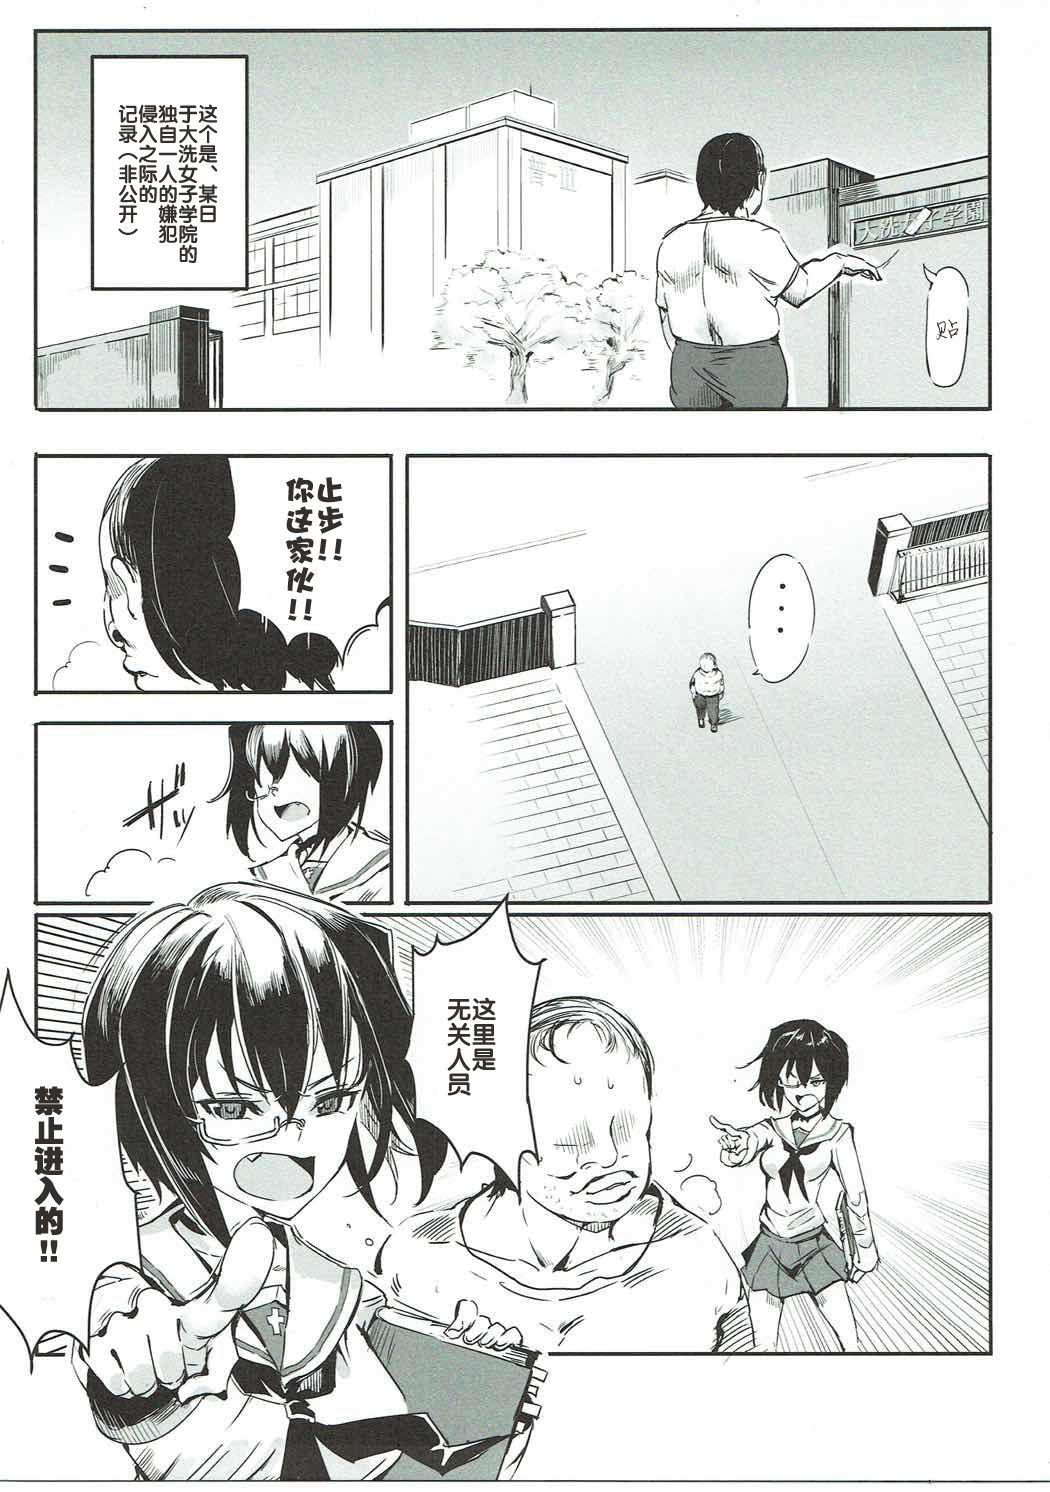 Girls & Kyousei Panpan 4